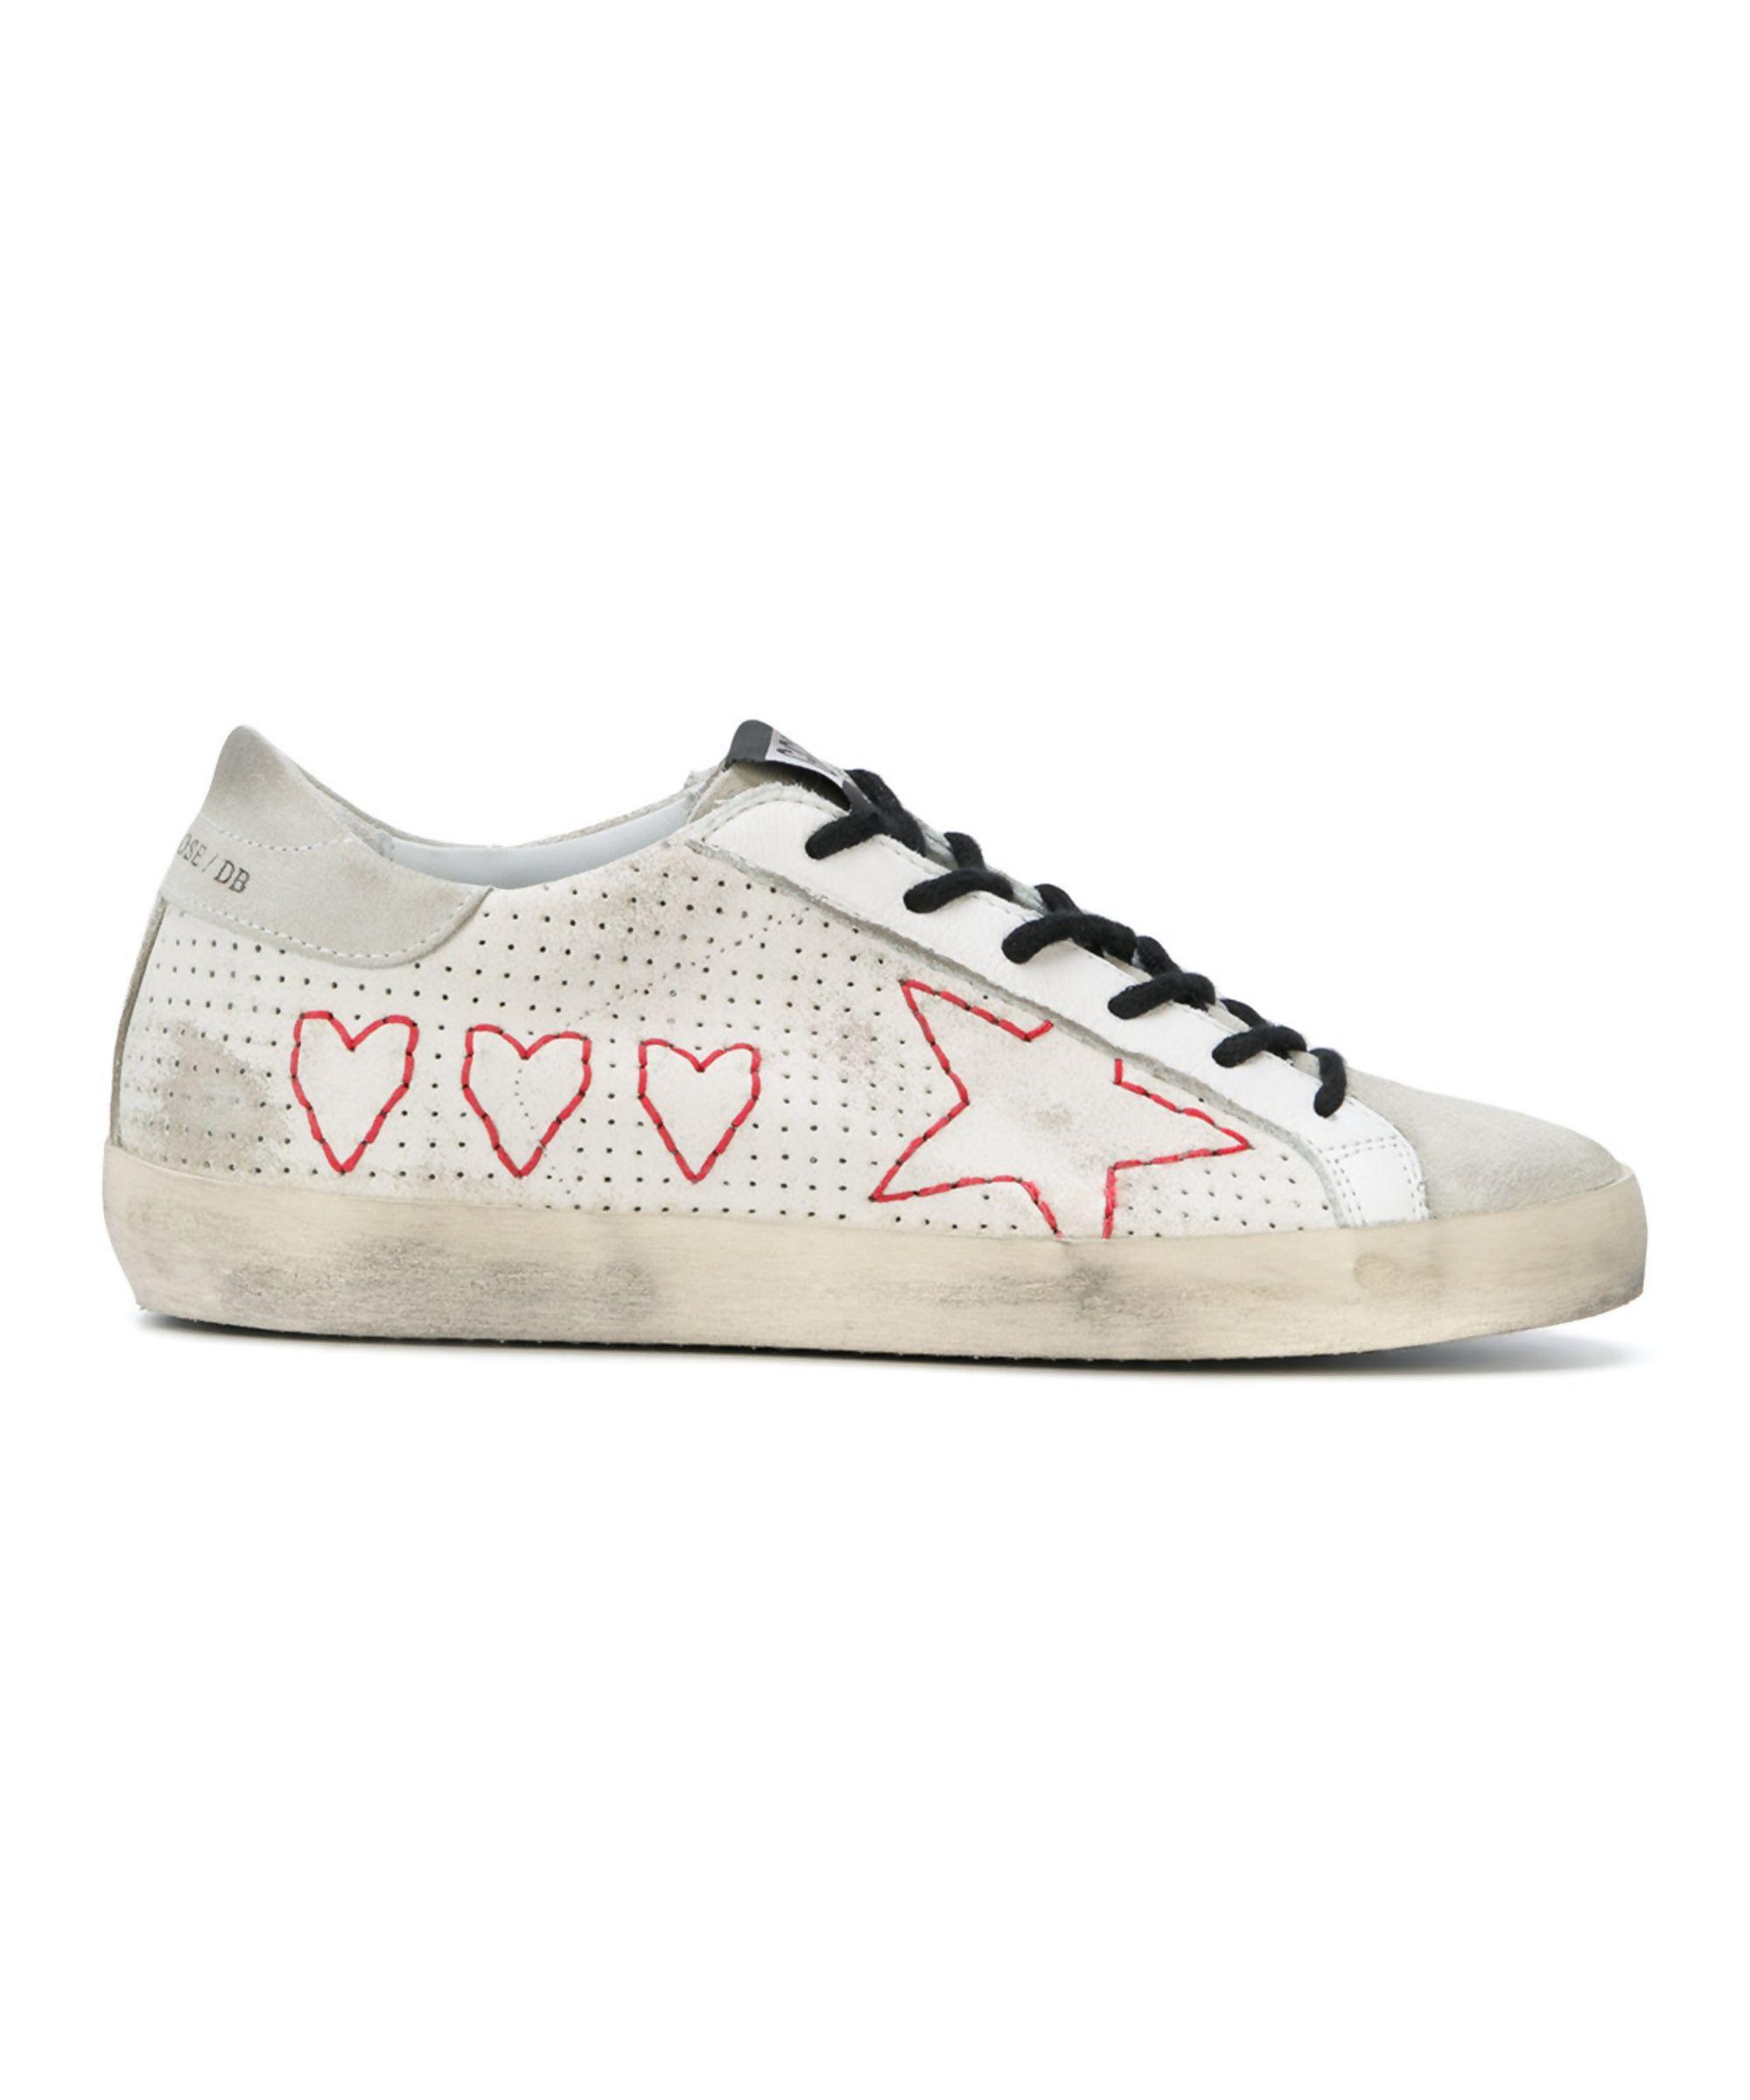 GOLDEN GOOSE | Golden Goose Women's White Leather Sneakers